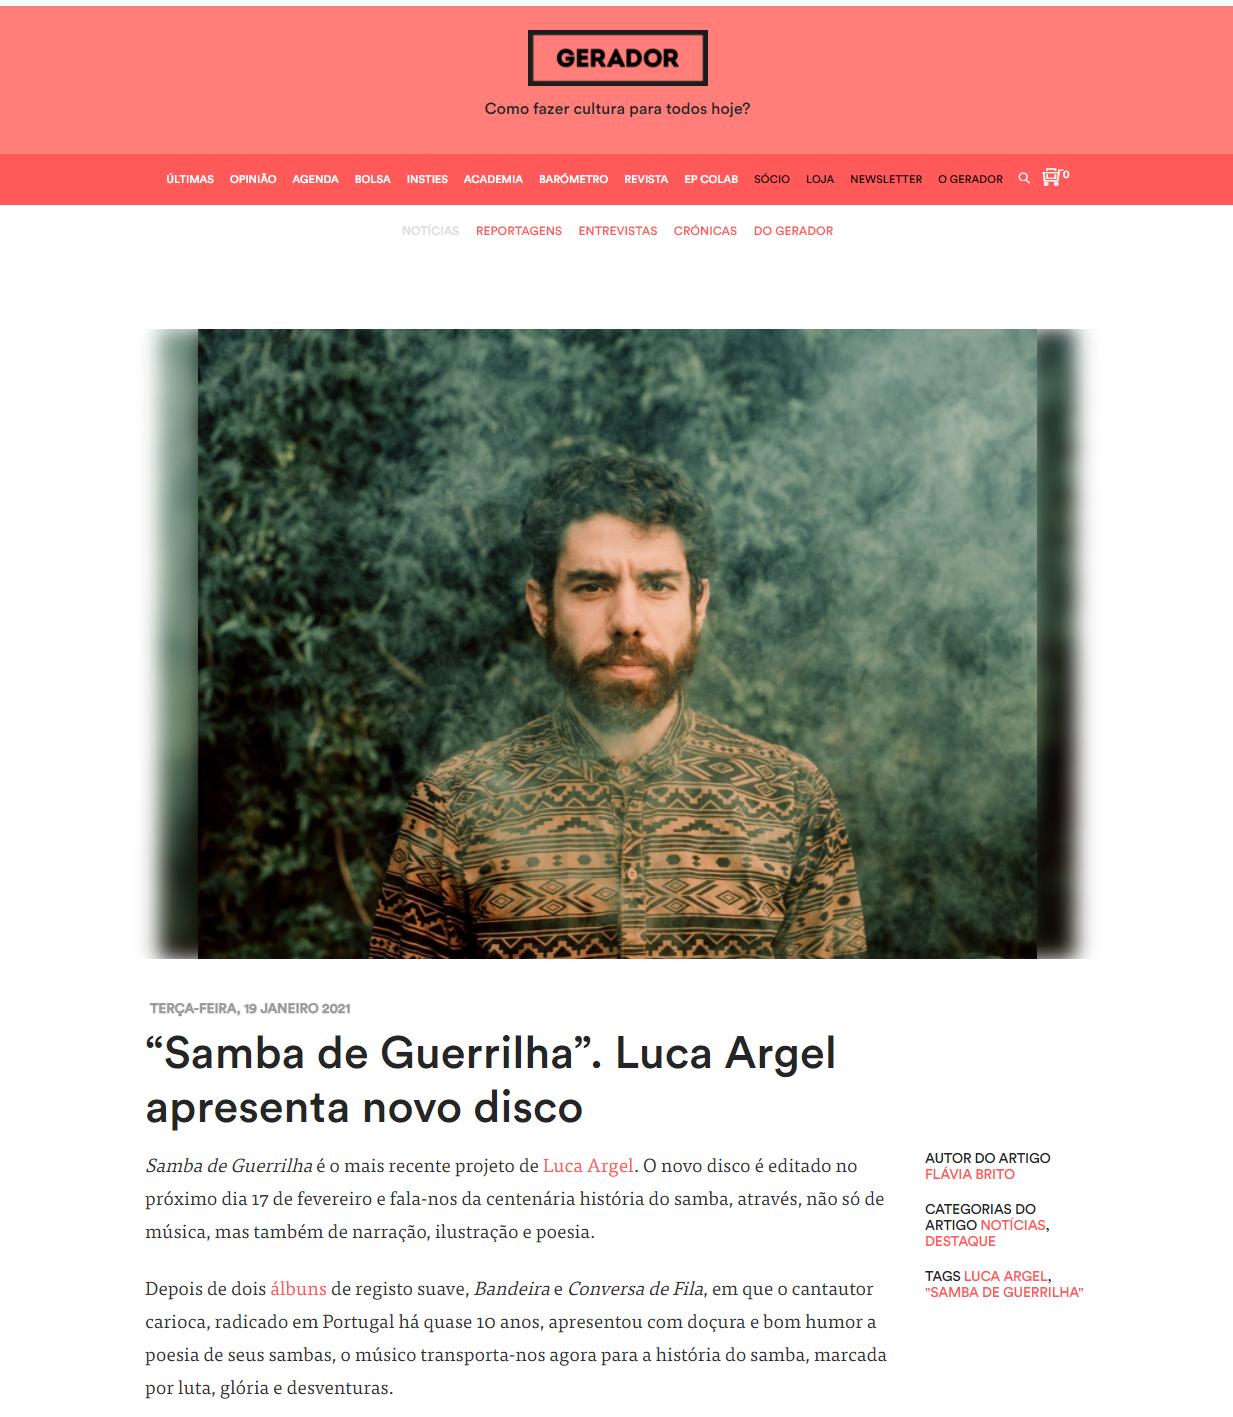 Samba de Guerrilha - Gerador